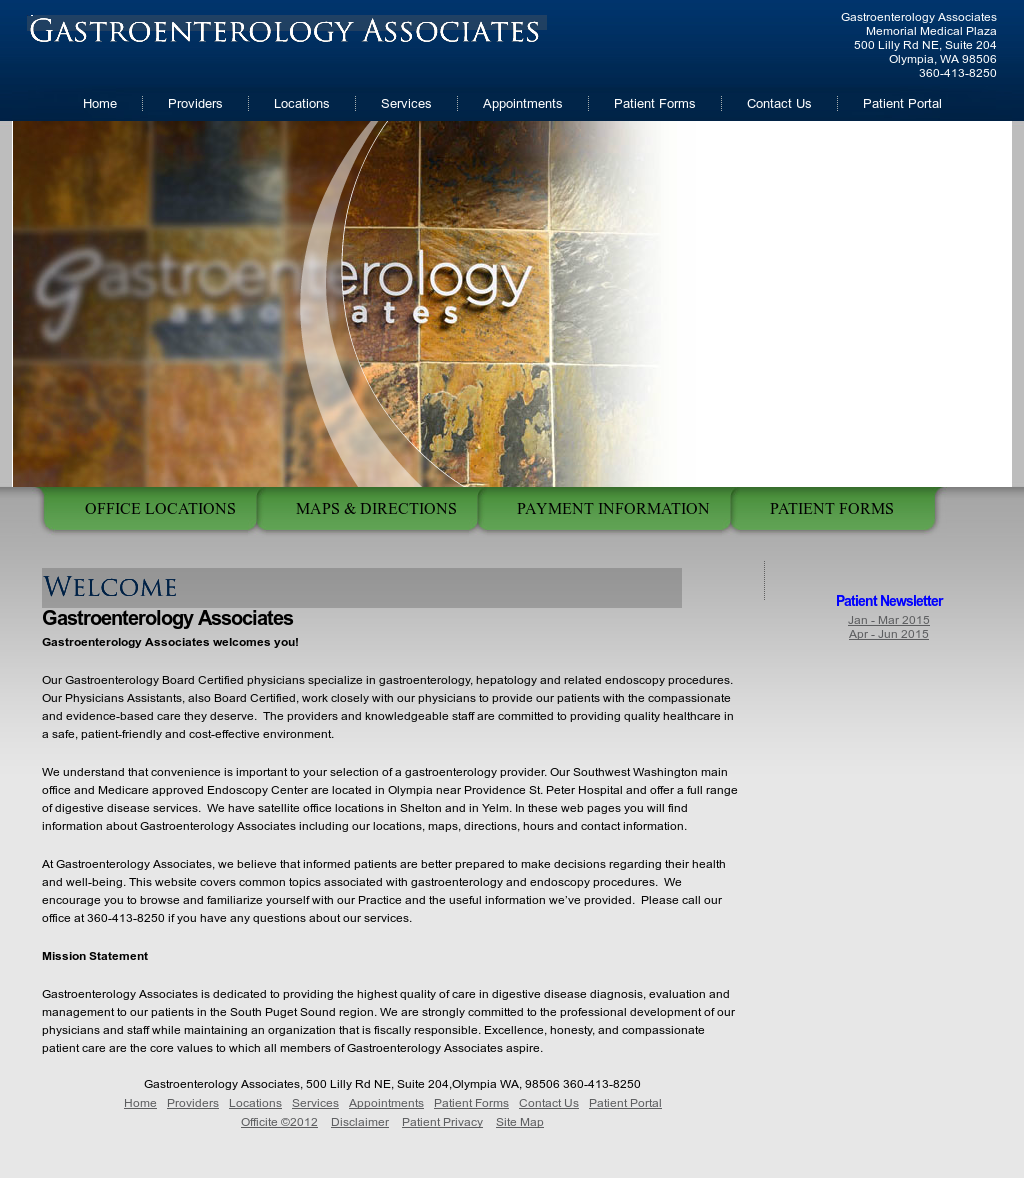 Gastroassociates Competitors, Revenue and Employees - Owler